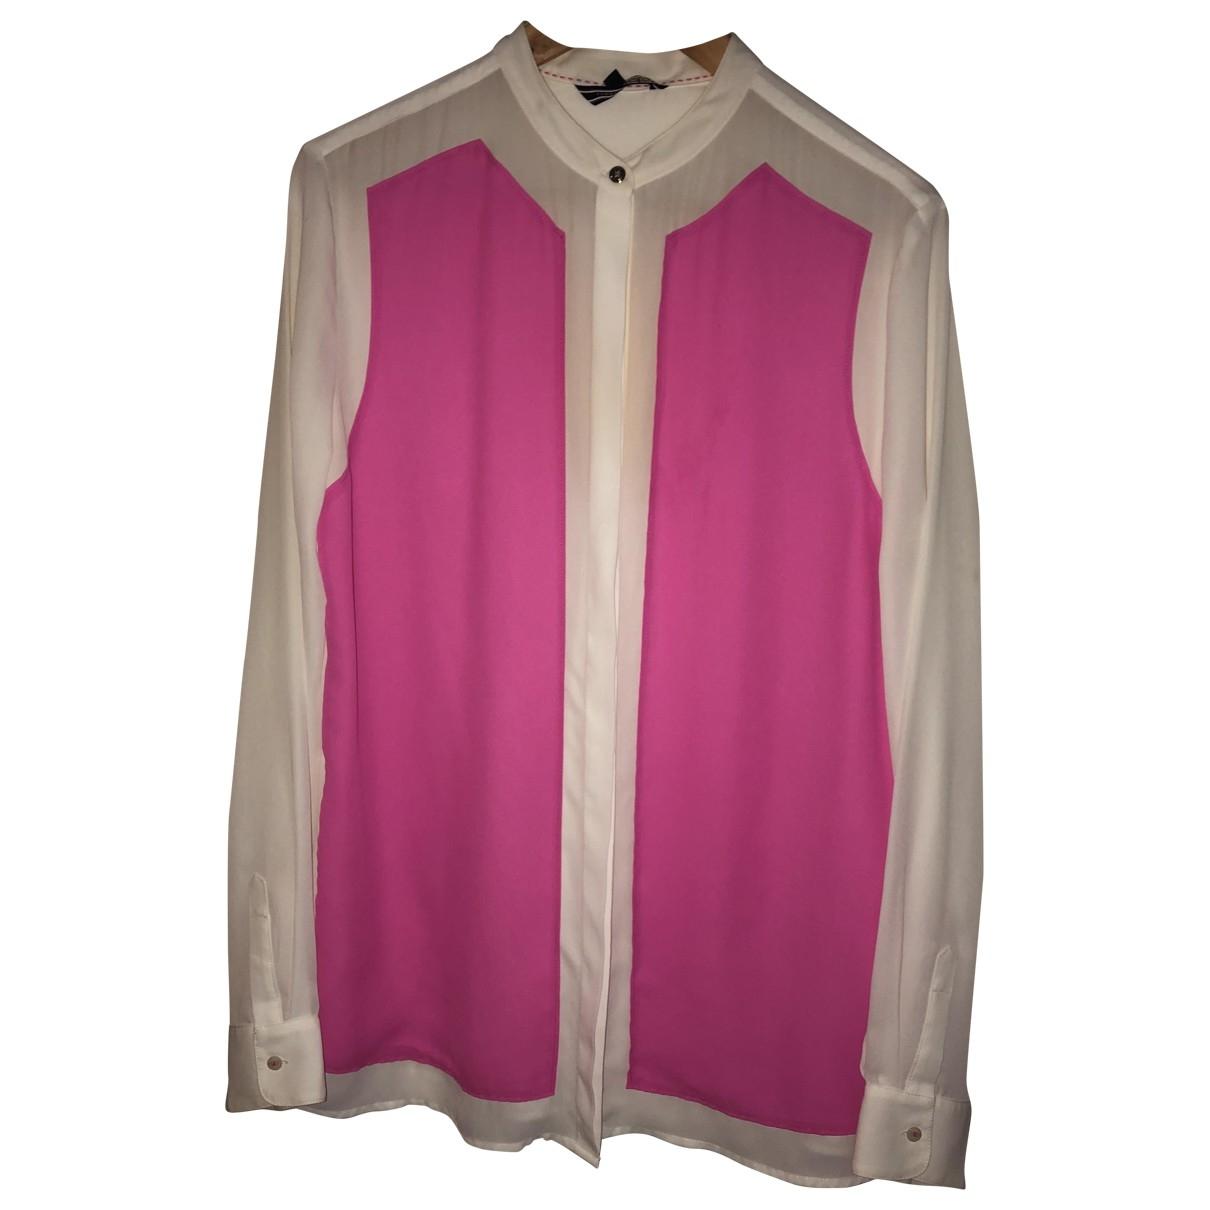 Tommy Hilfiger \N Pink  top for Women 40 FR